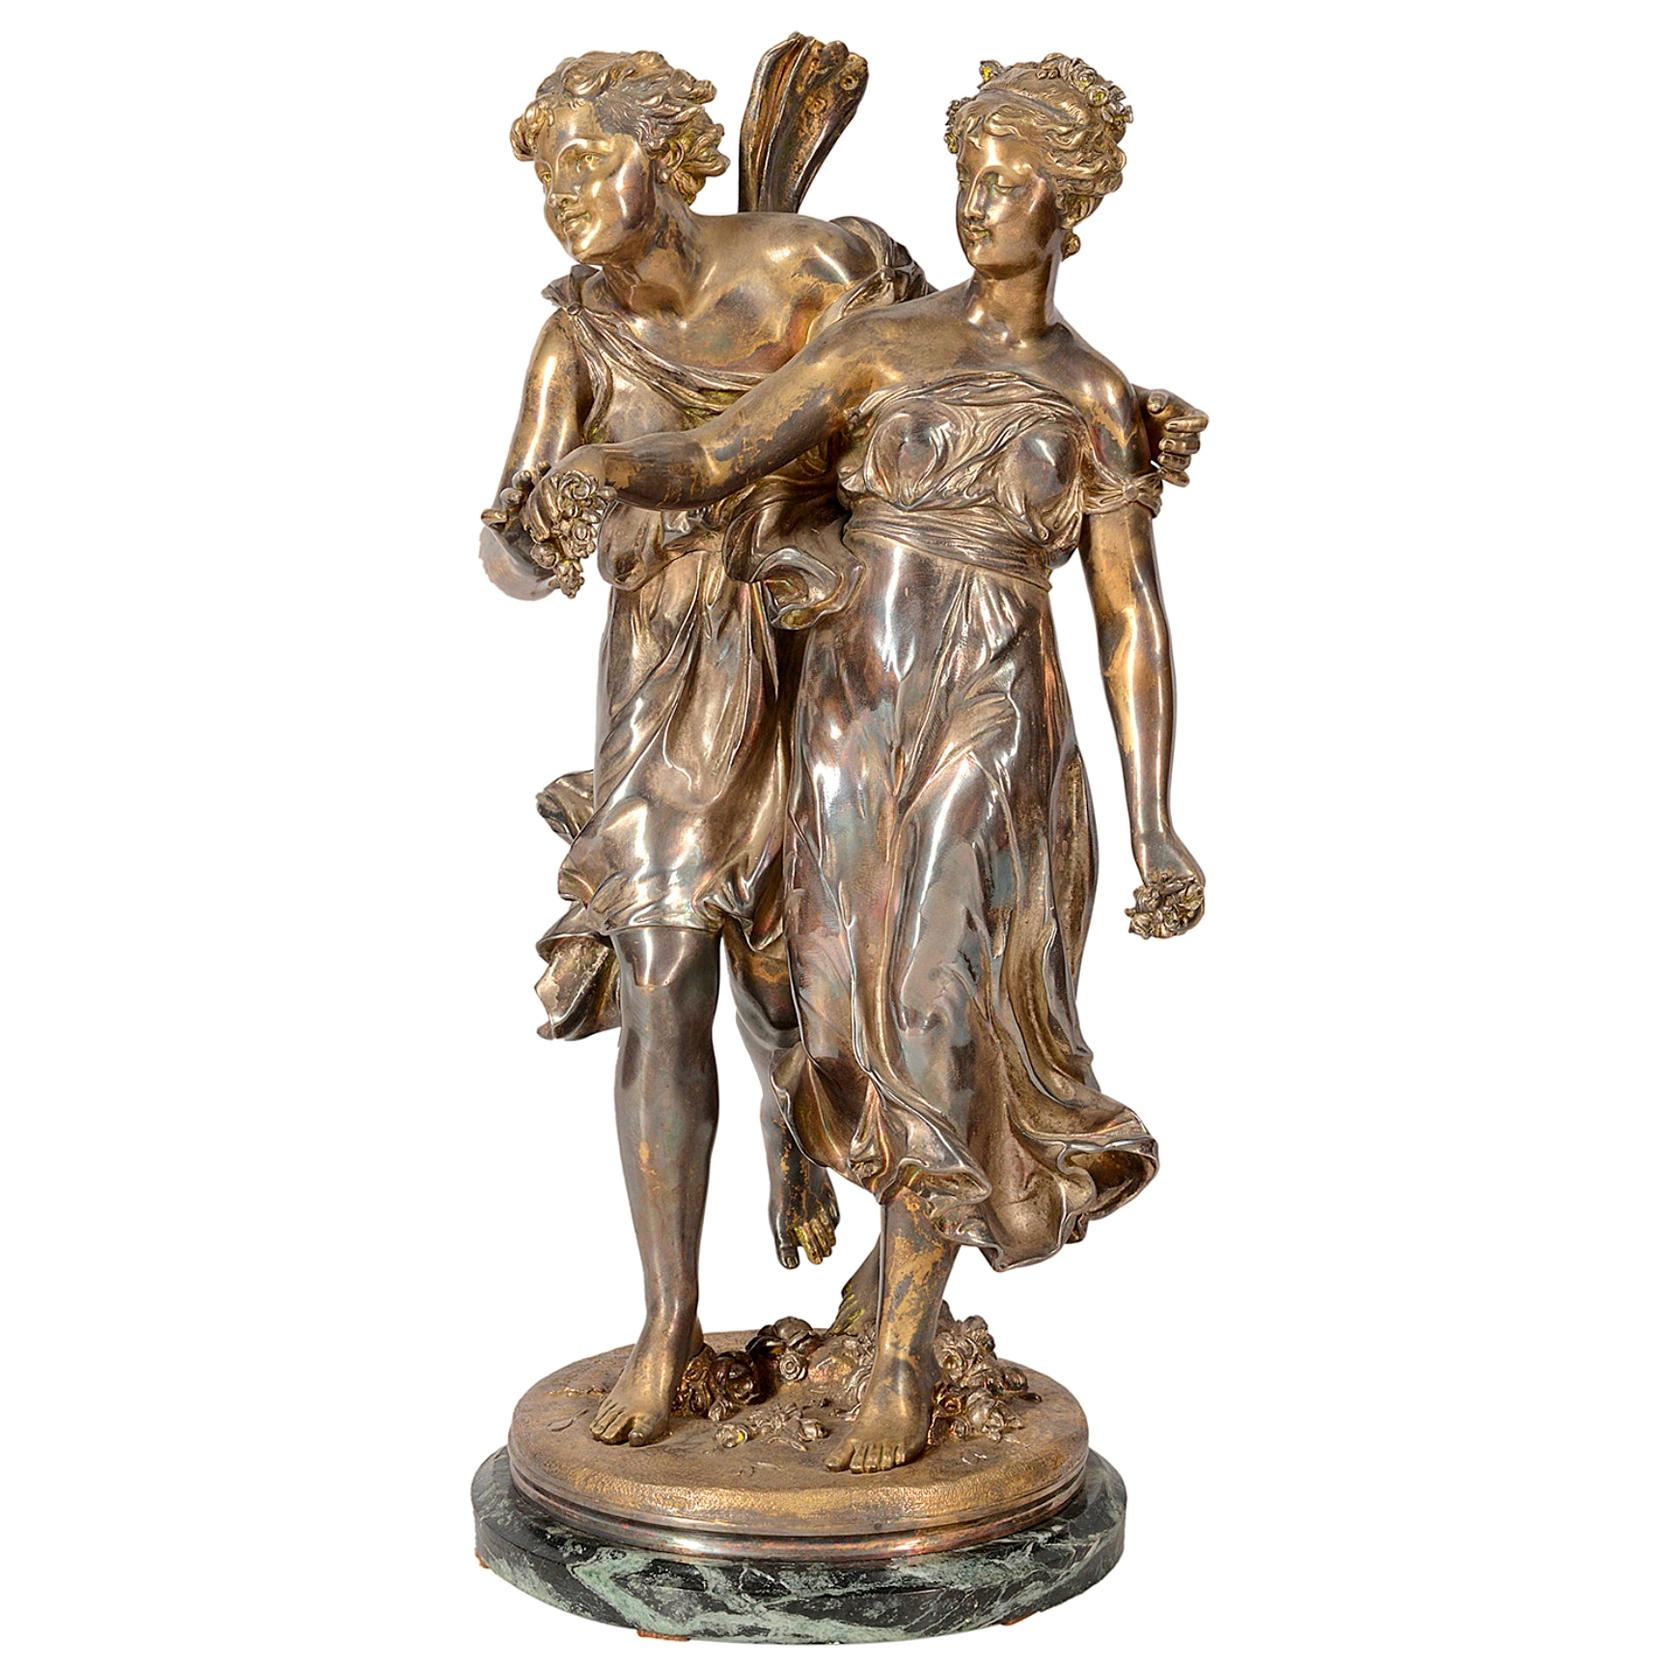 19th Century Silvered Bronze Statue of Cherub and Maiden, by 'Dumaige'